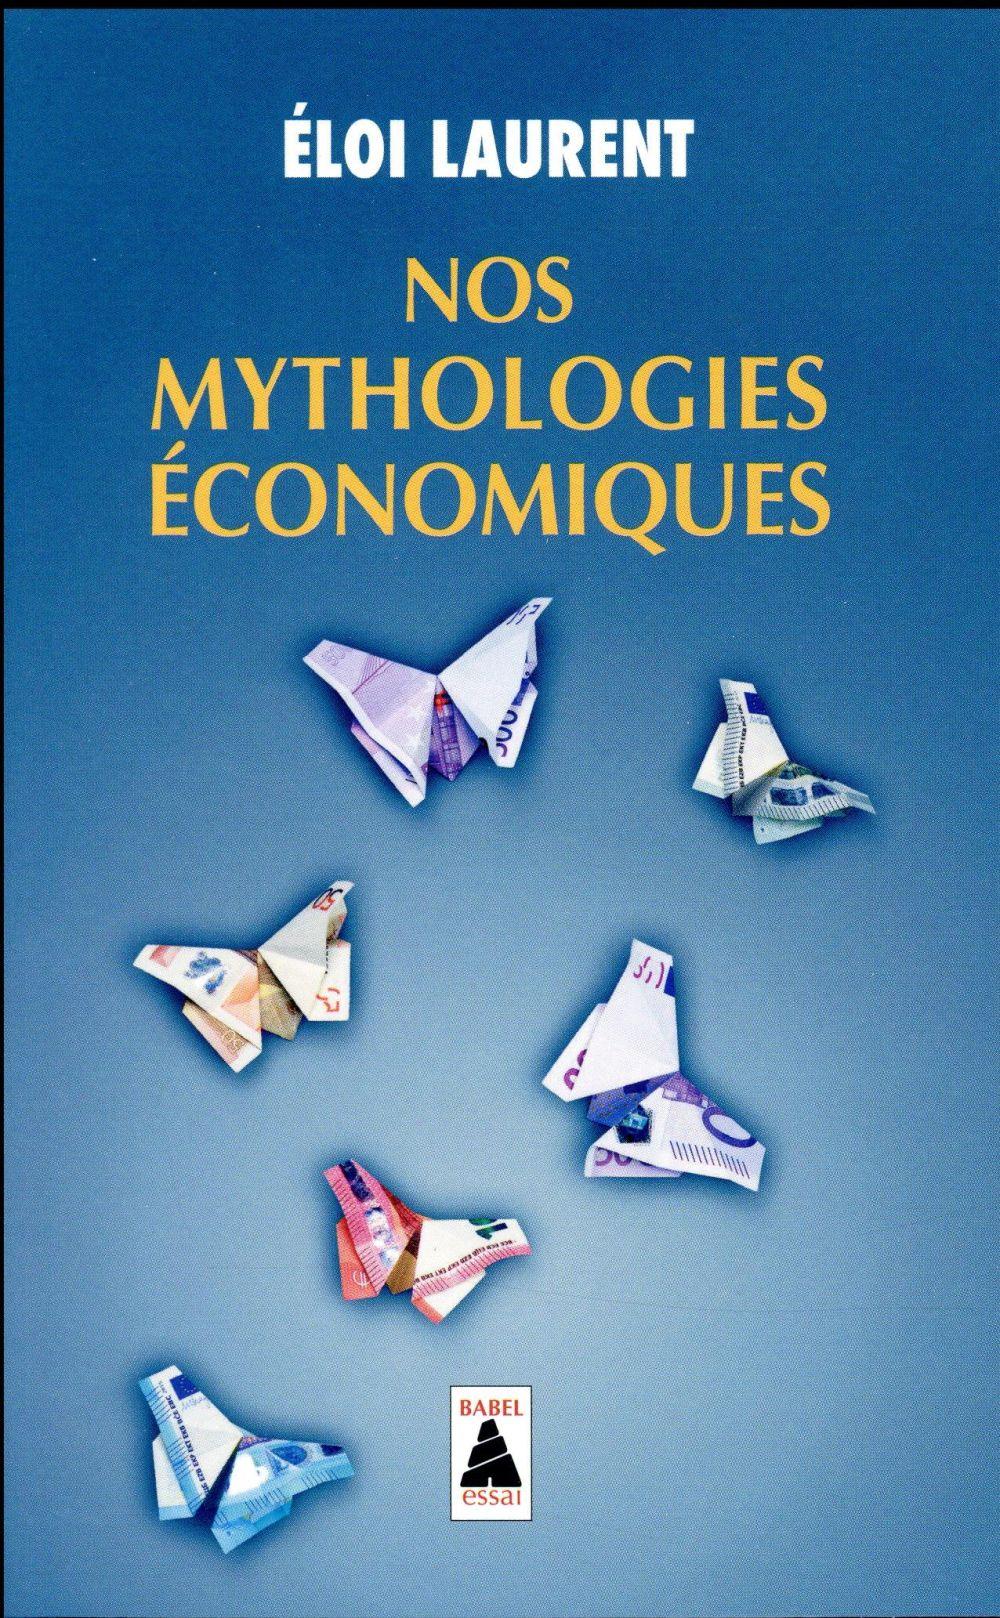 NOS MYTHOLOGIES ECONOMIQUES (BABEL)